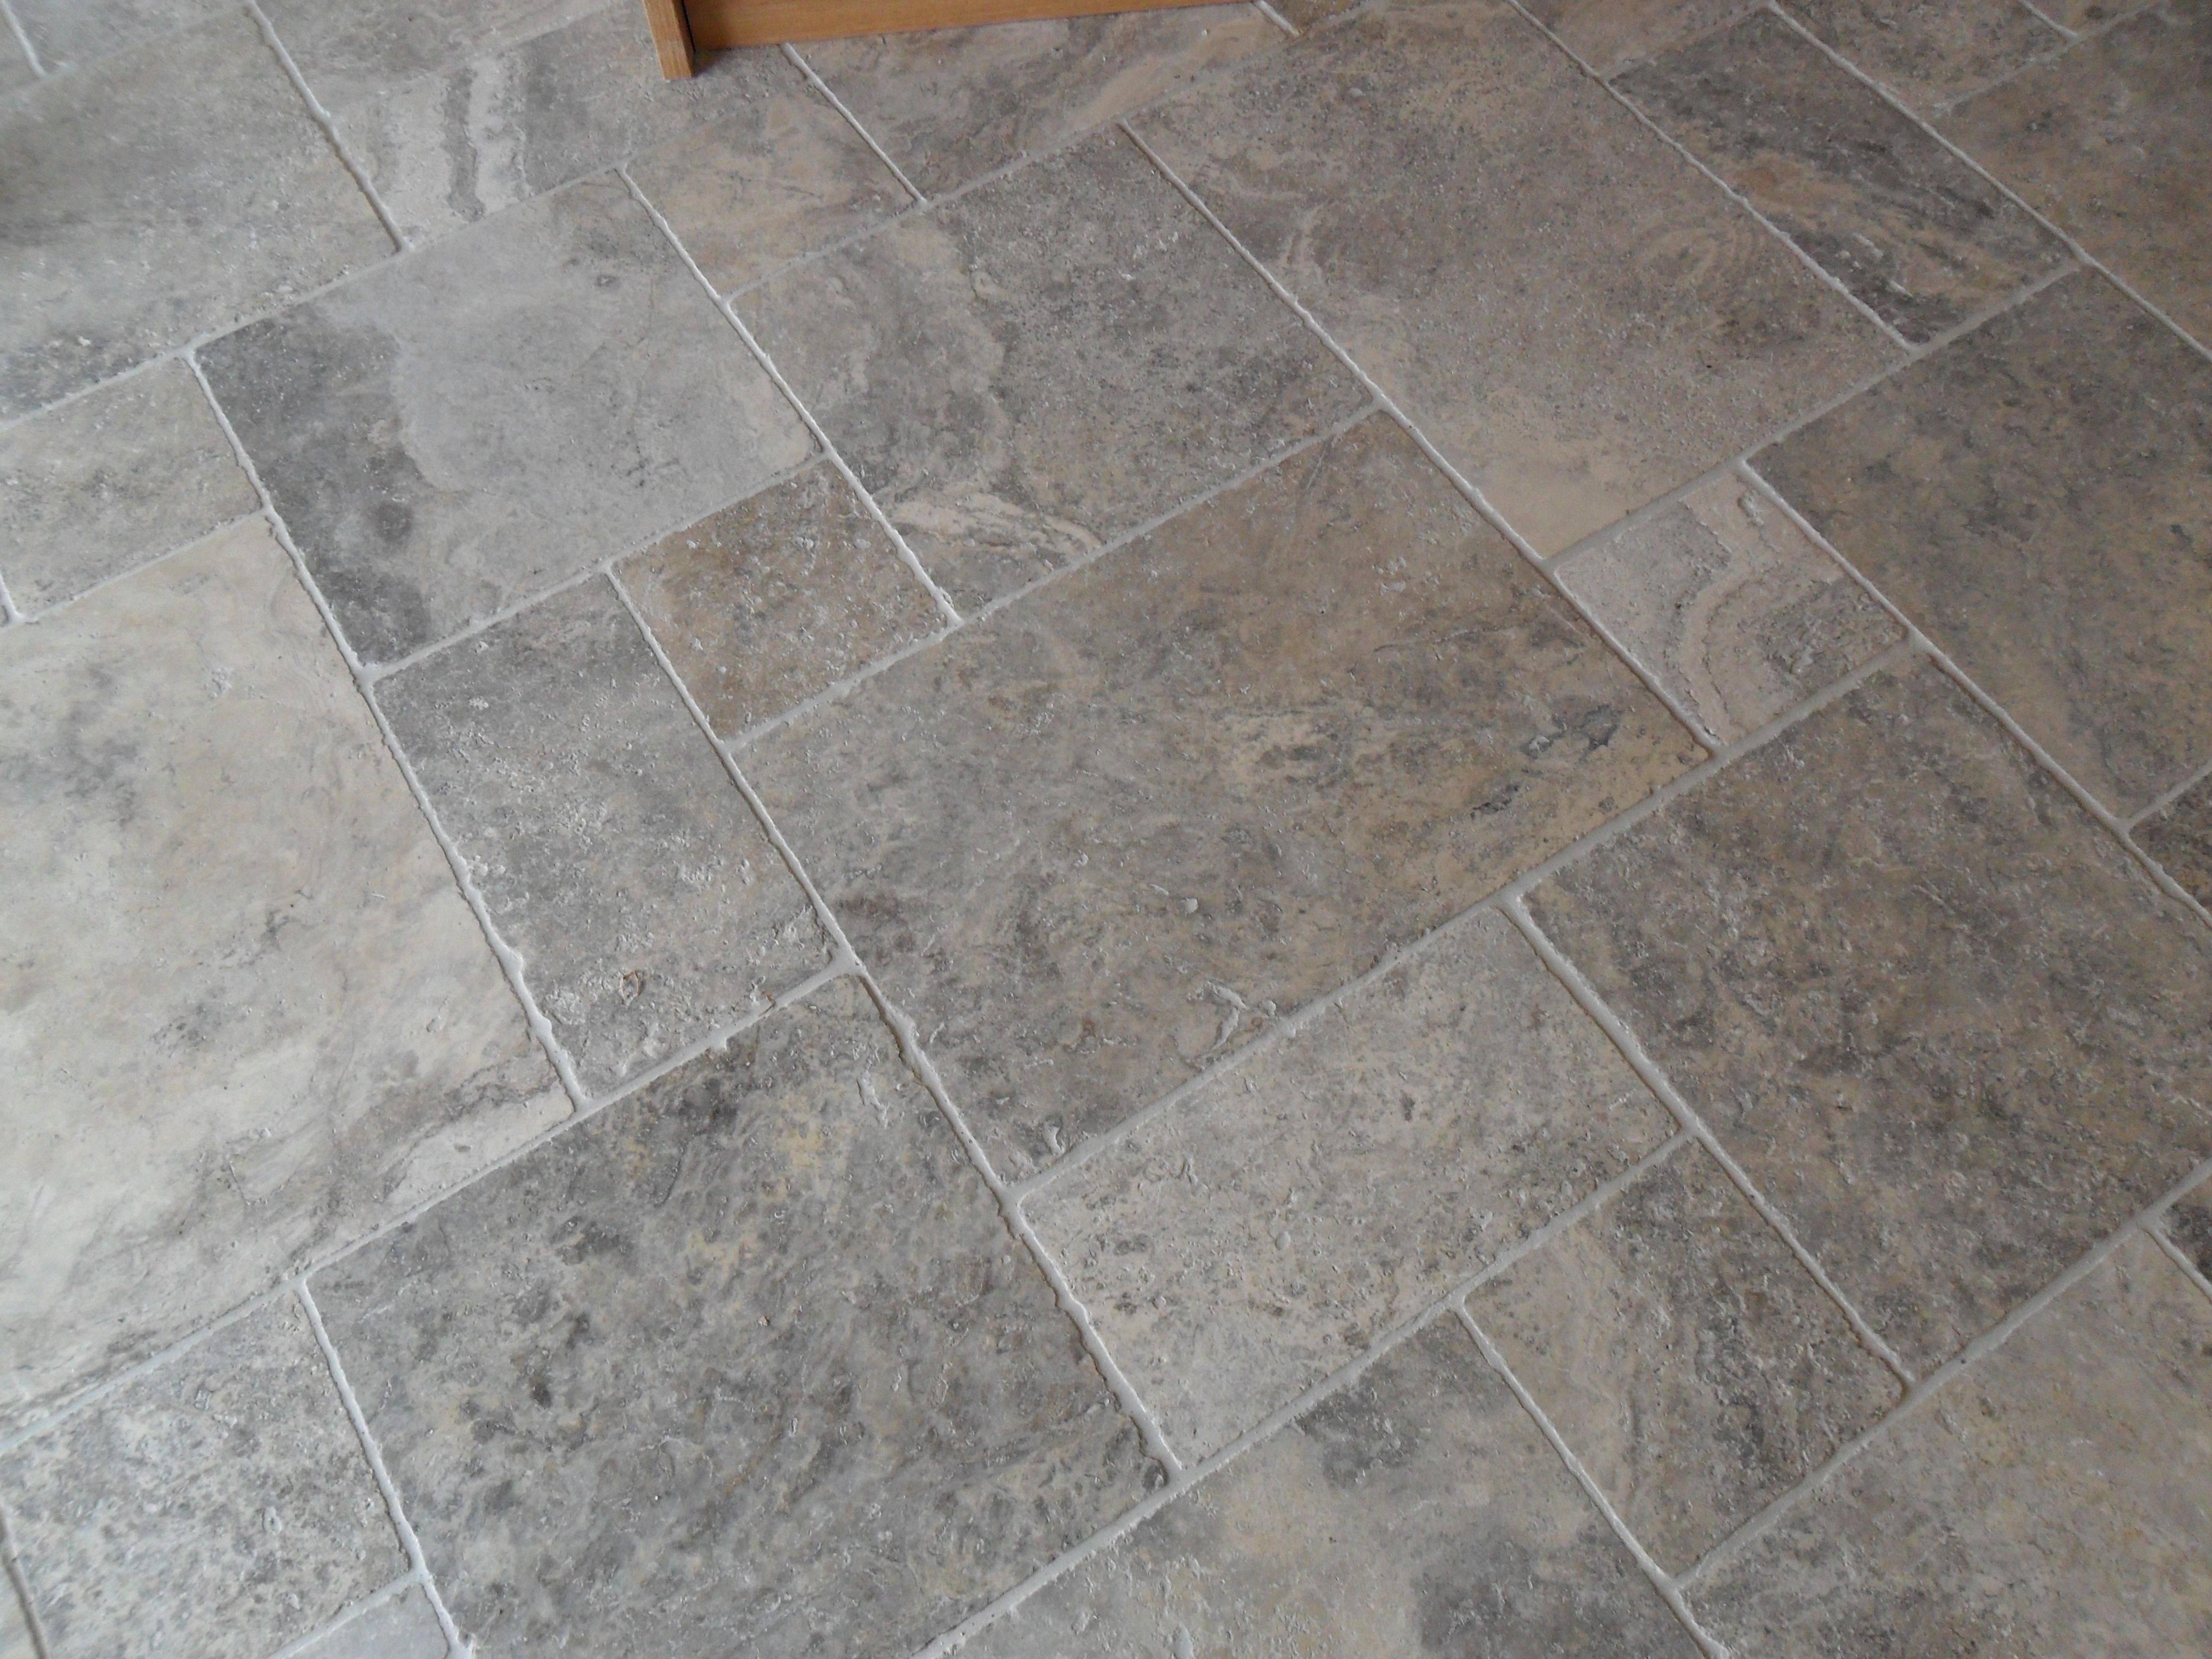 Travertine Quality Natural Stone Tiles Chameleon Stone Stone Tiles Kitchen Stone Flooring Natural Stone Flooring